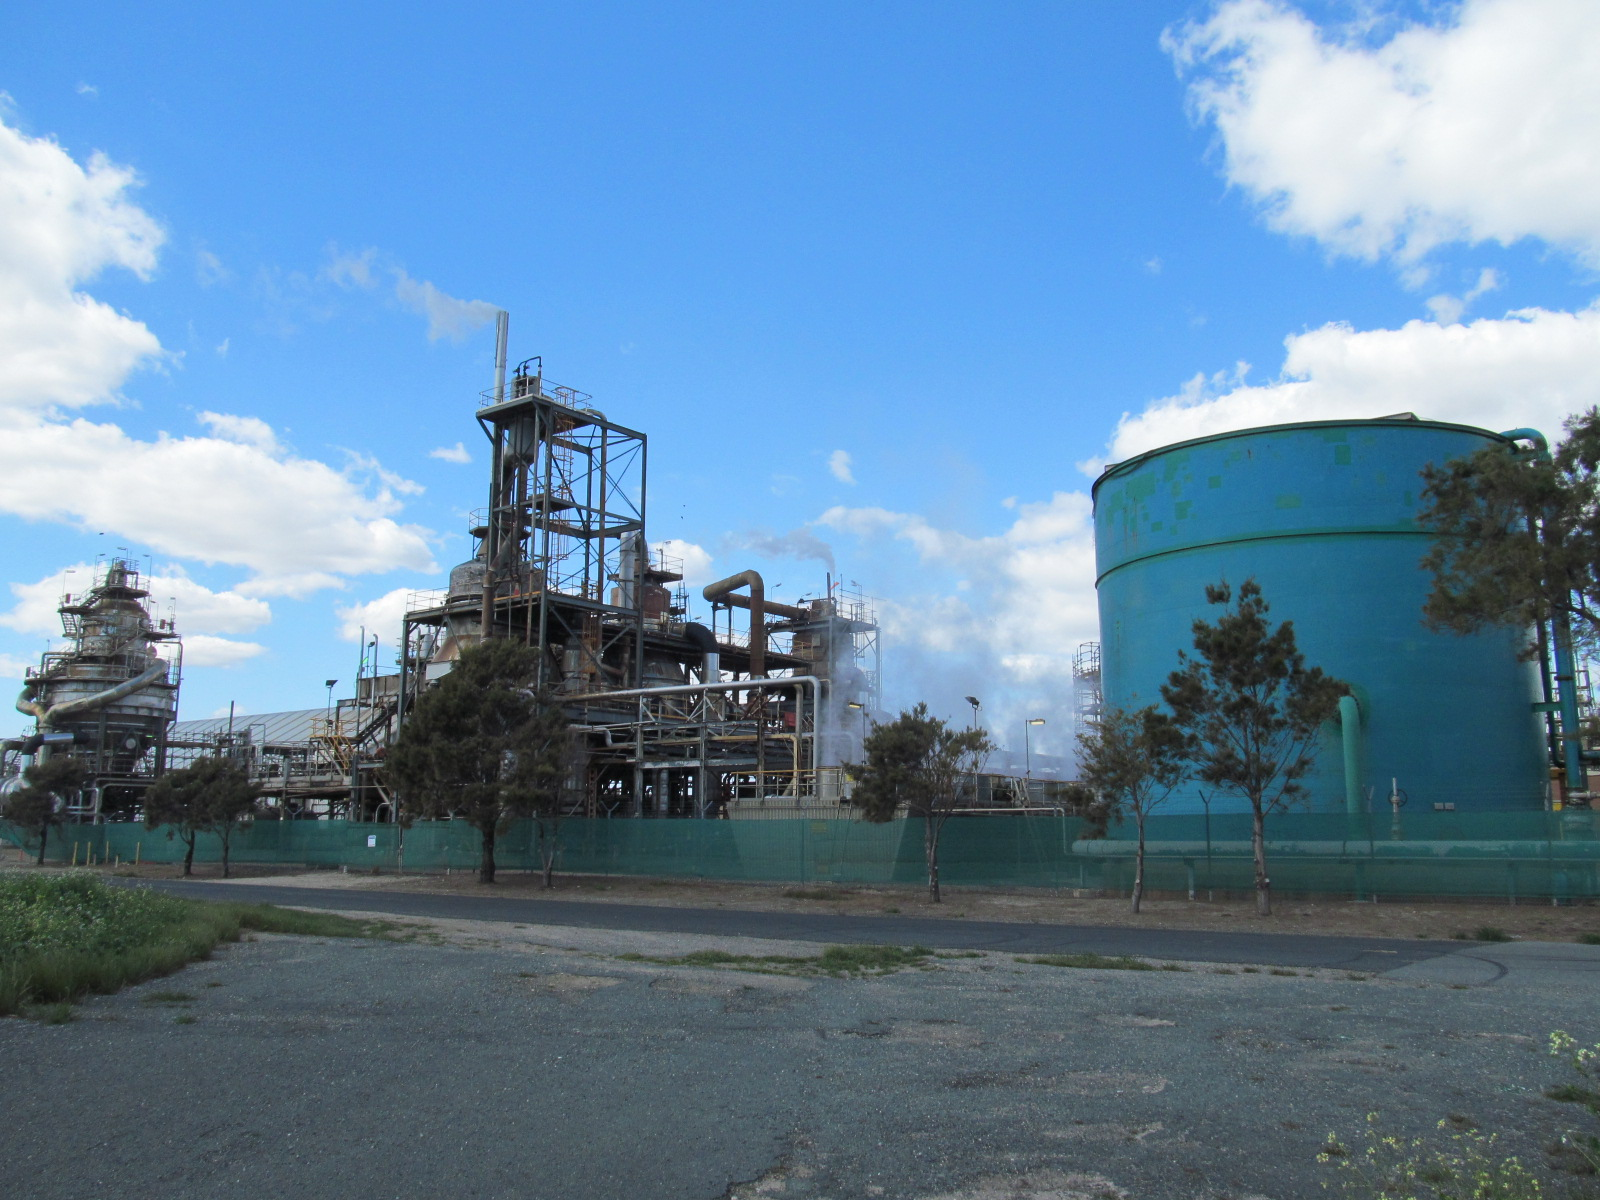 File:Kwinana Nickel Refinery W5 jpg - Wikimedia Commons